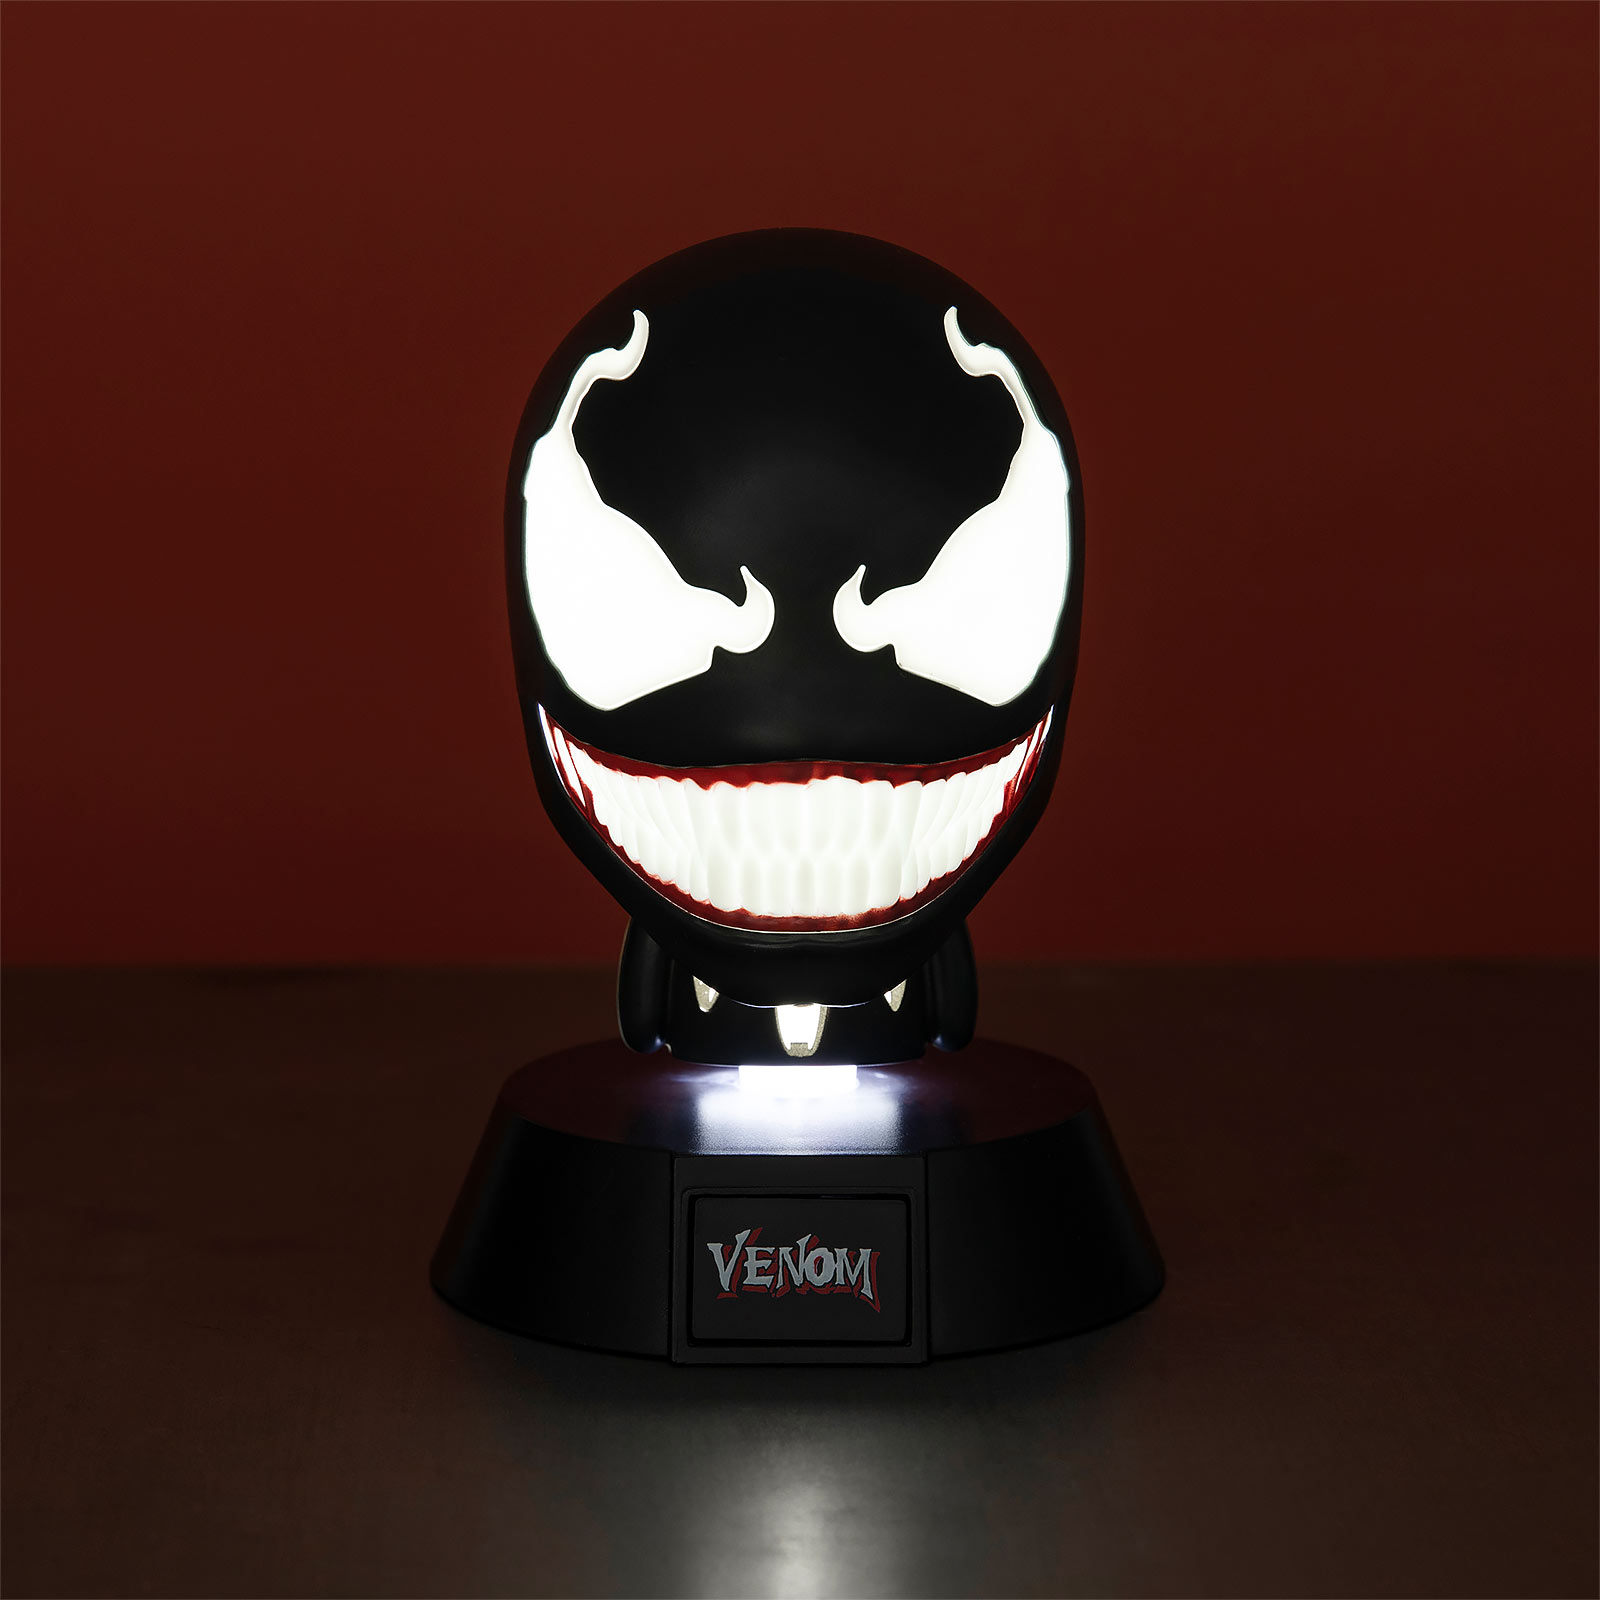 Marvel - Venom Icons 3D Tischlampe